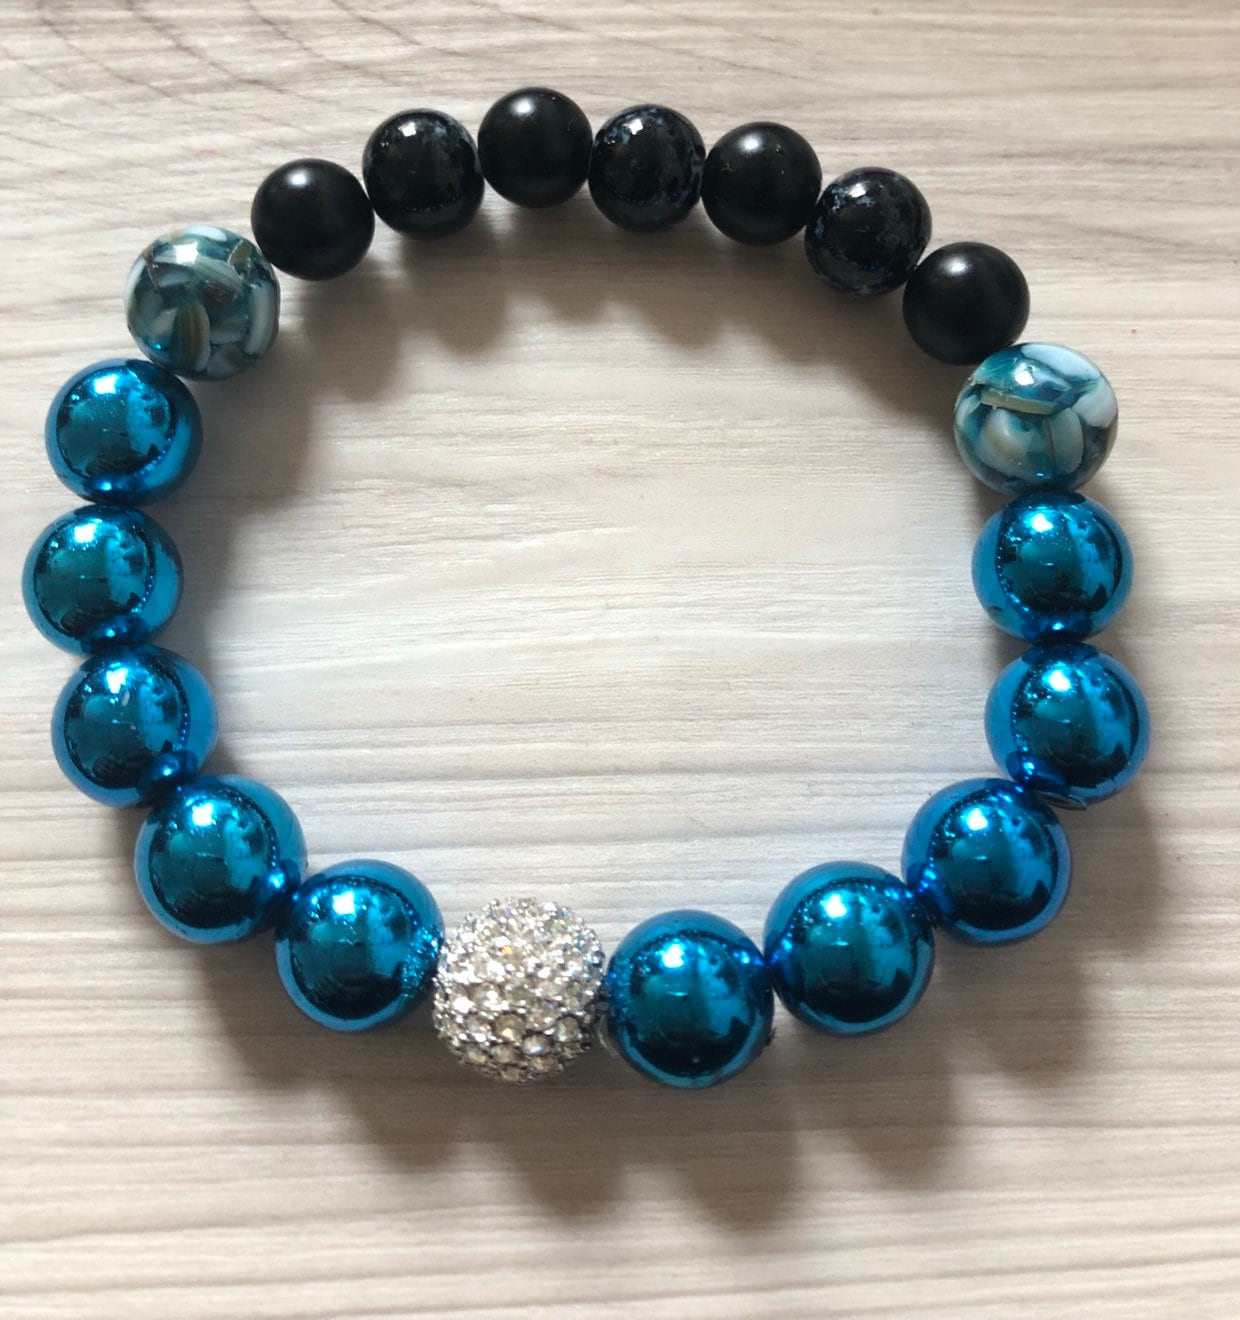 Black Owned Shop Intention Bracelet Gemstone Bracelet Healing Jewelry Jasper Accent Beaded Jewelry